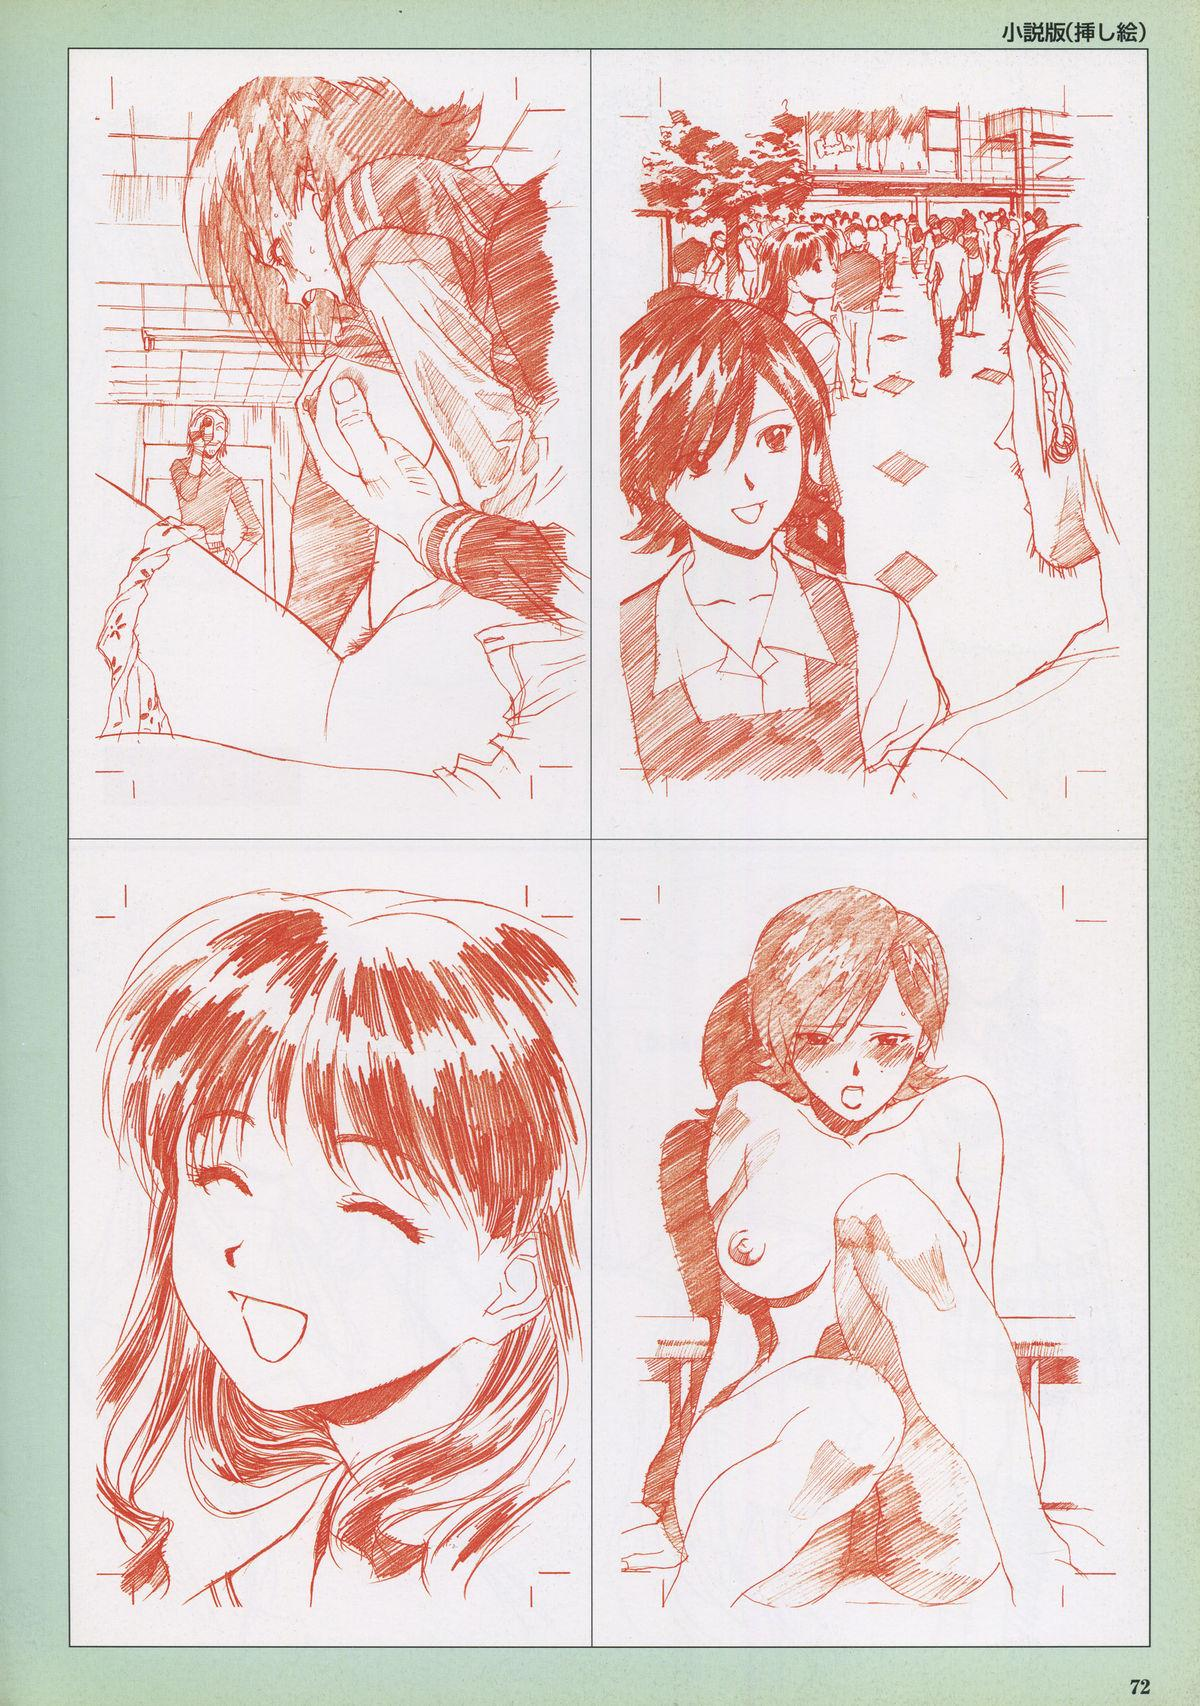 VIPER Series Official Artbook III 74